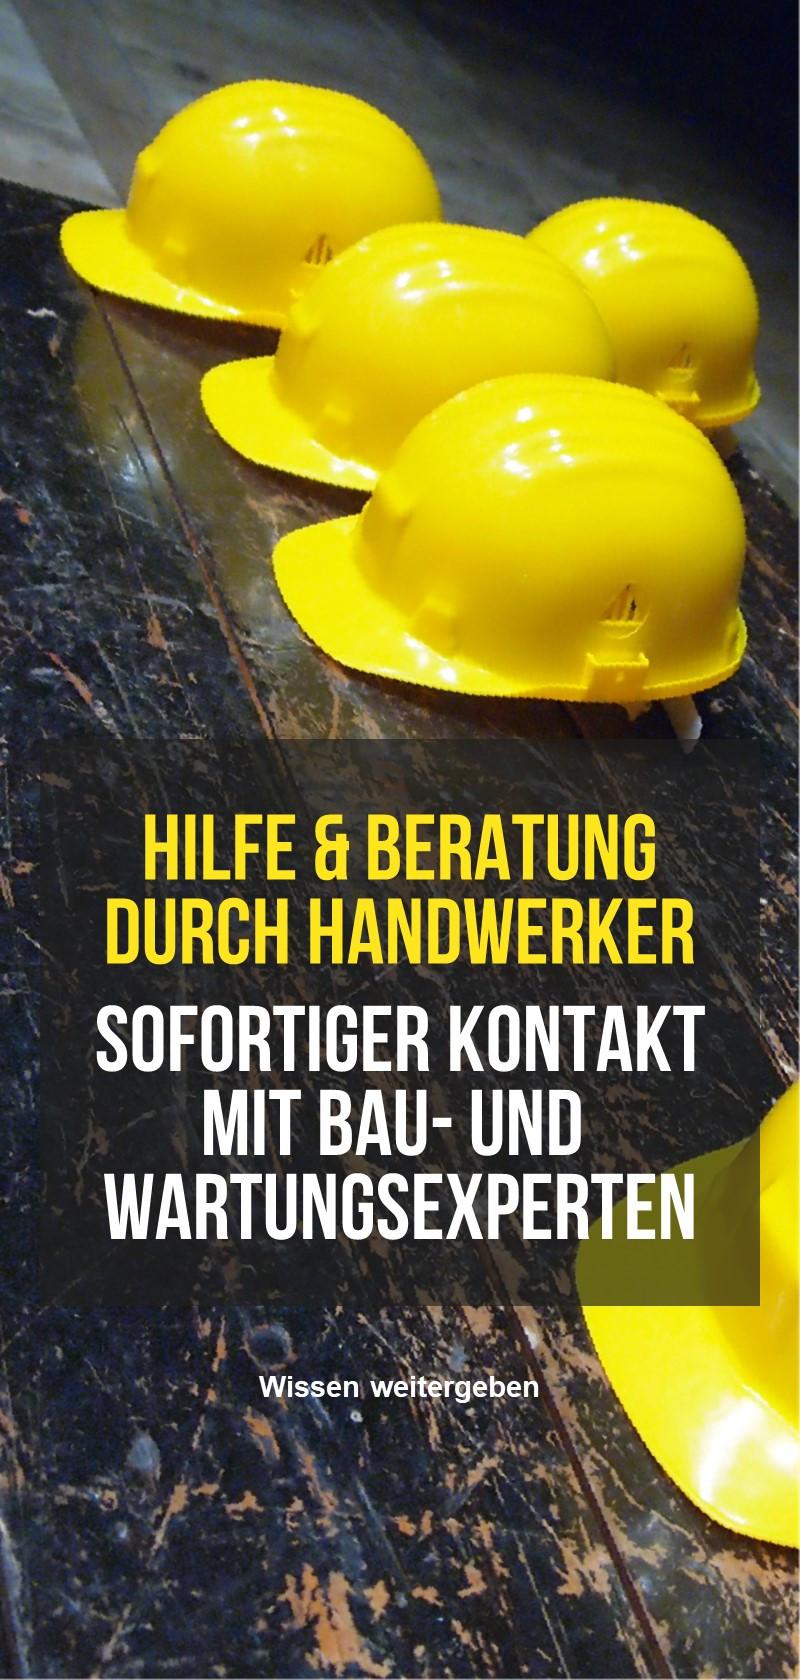 Baufachleute